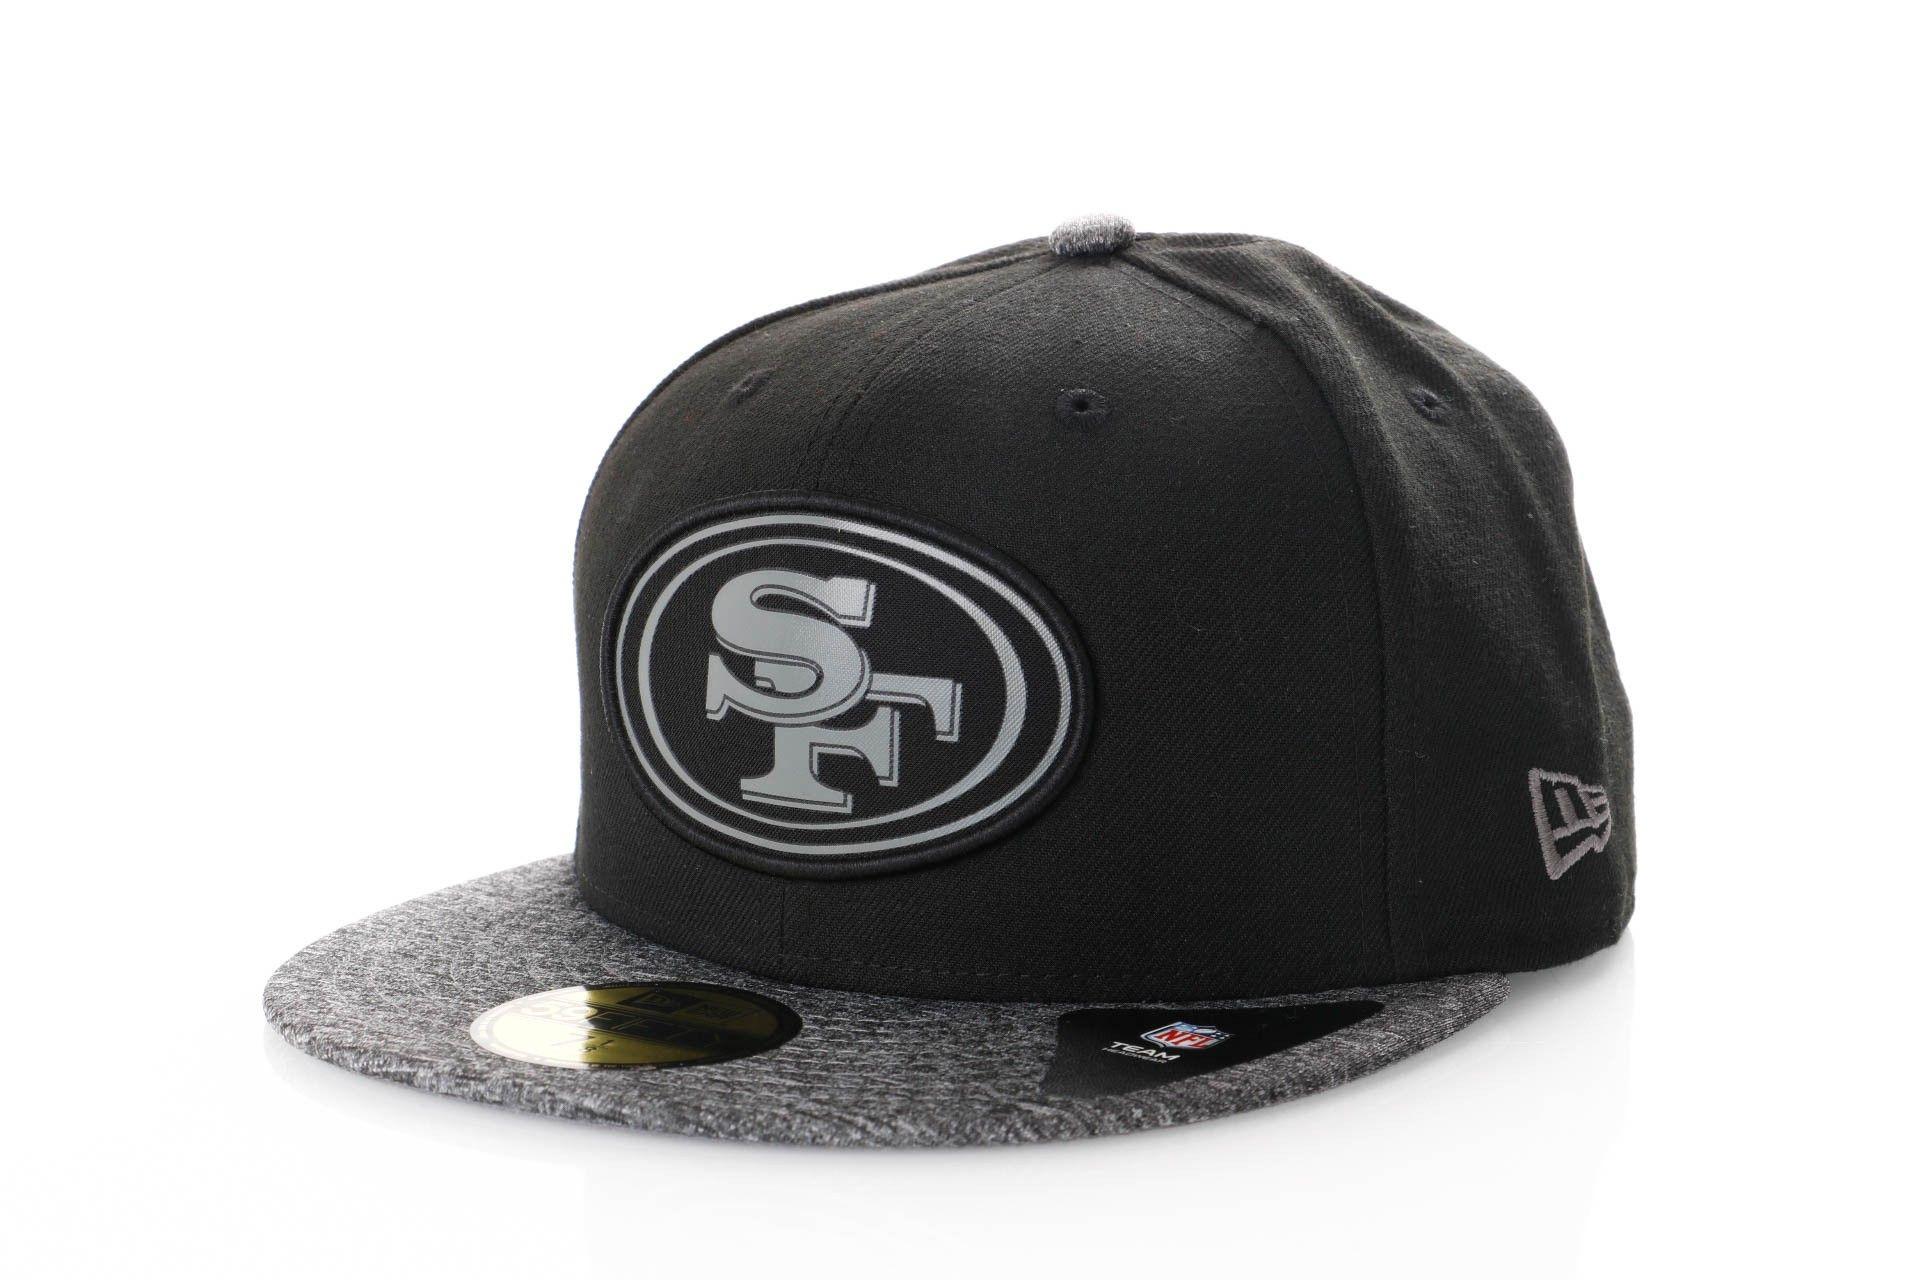 Afbeelding van New Era Fitted Cap San Francisco 49ers melange two tone